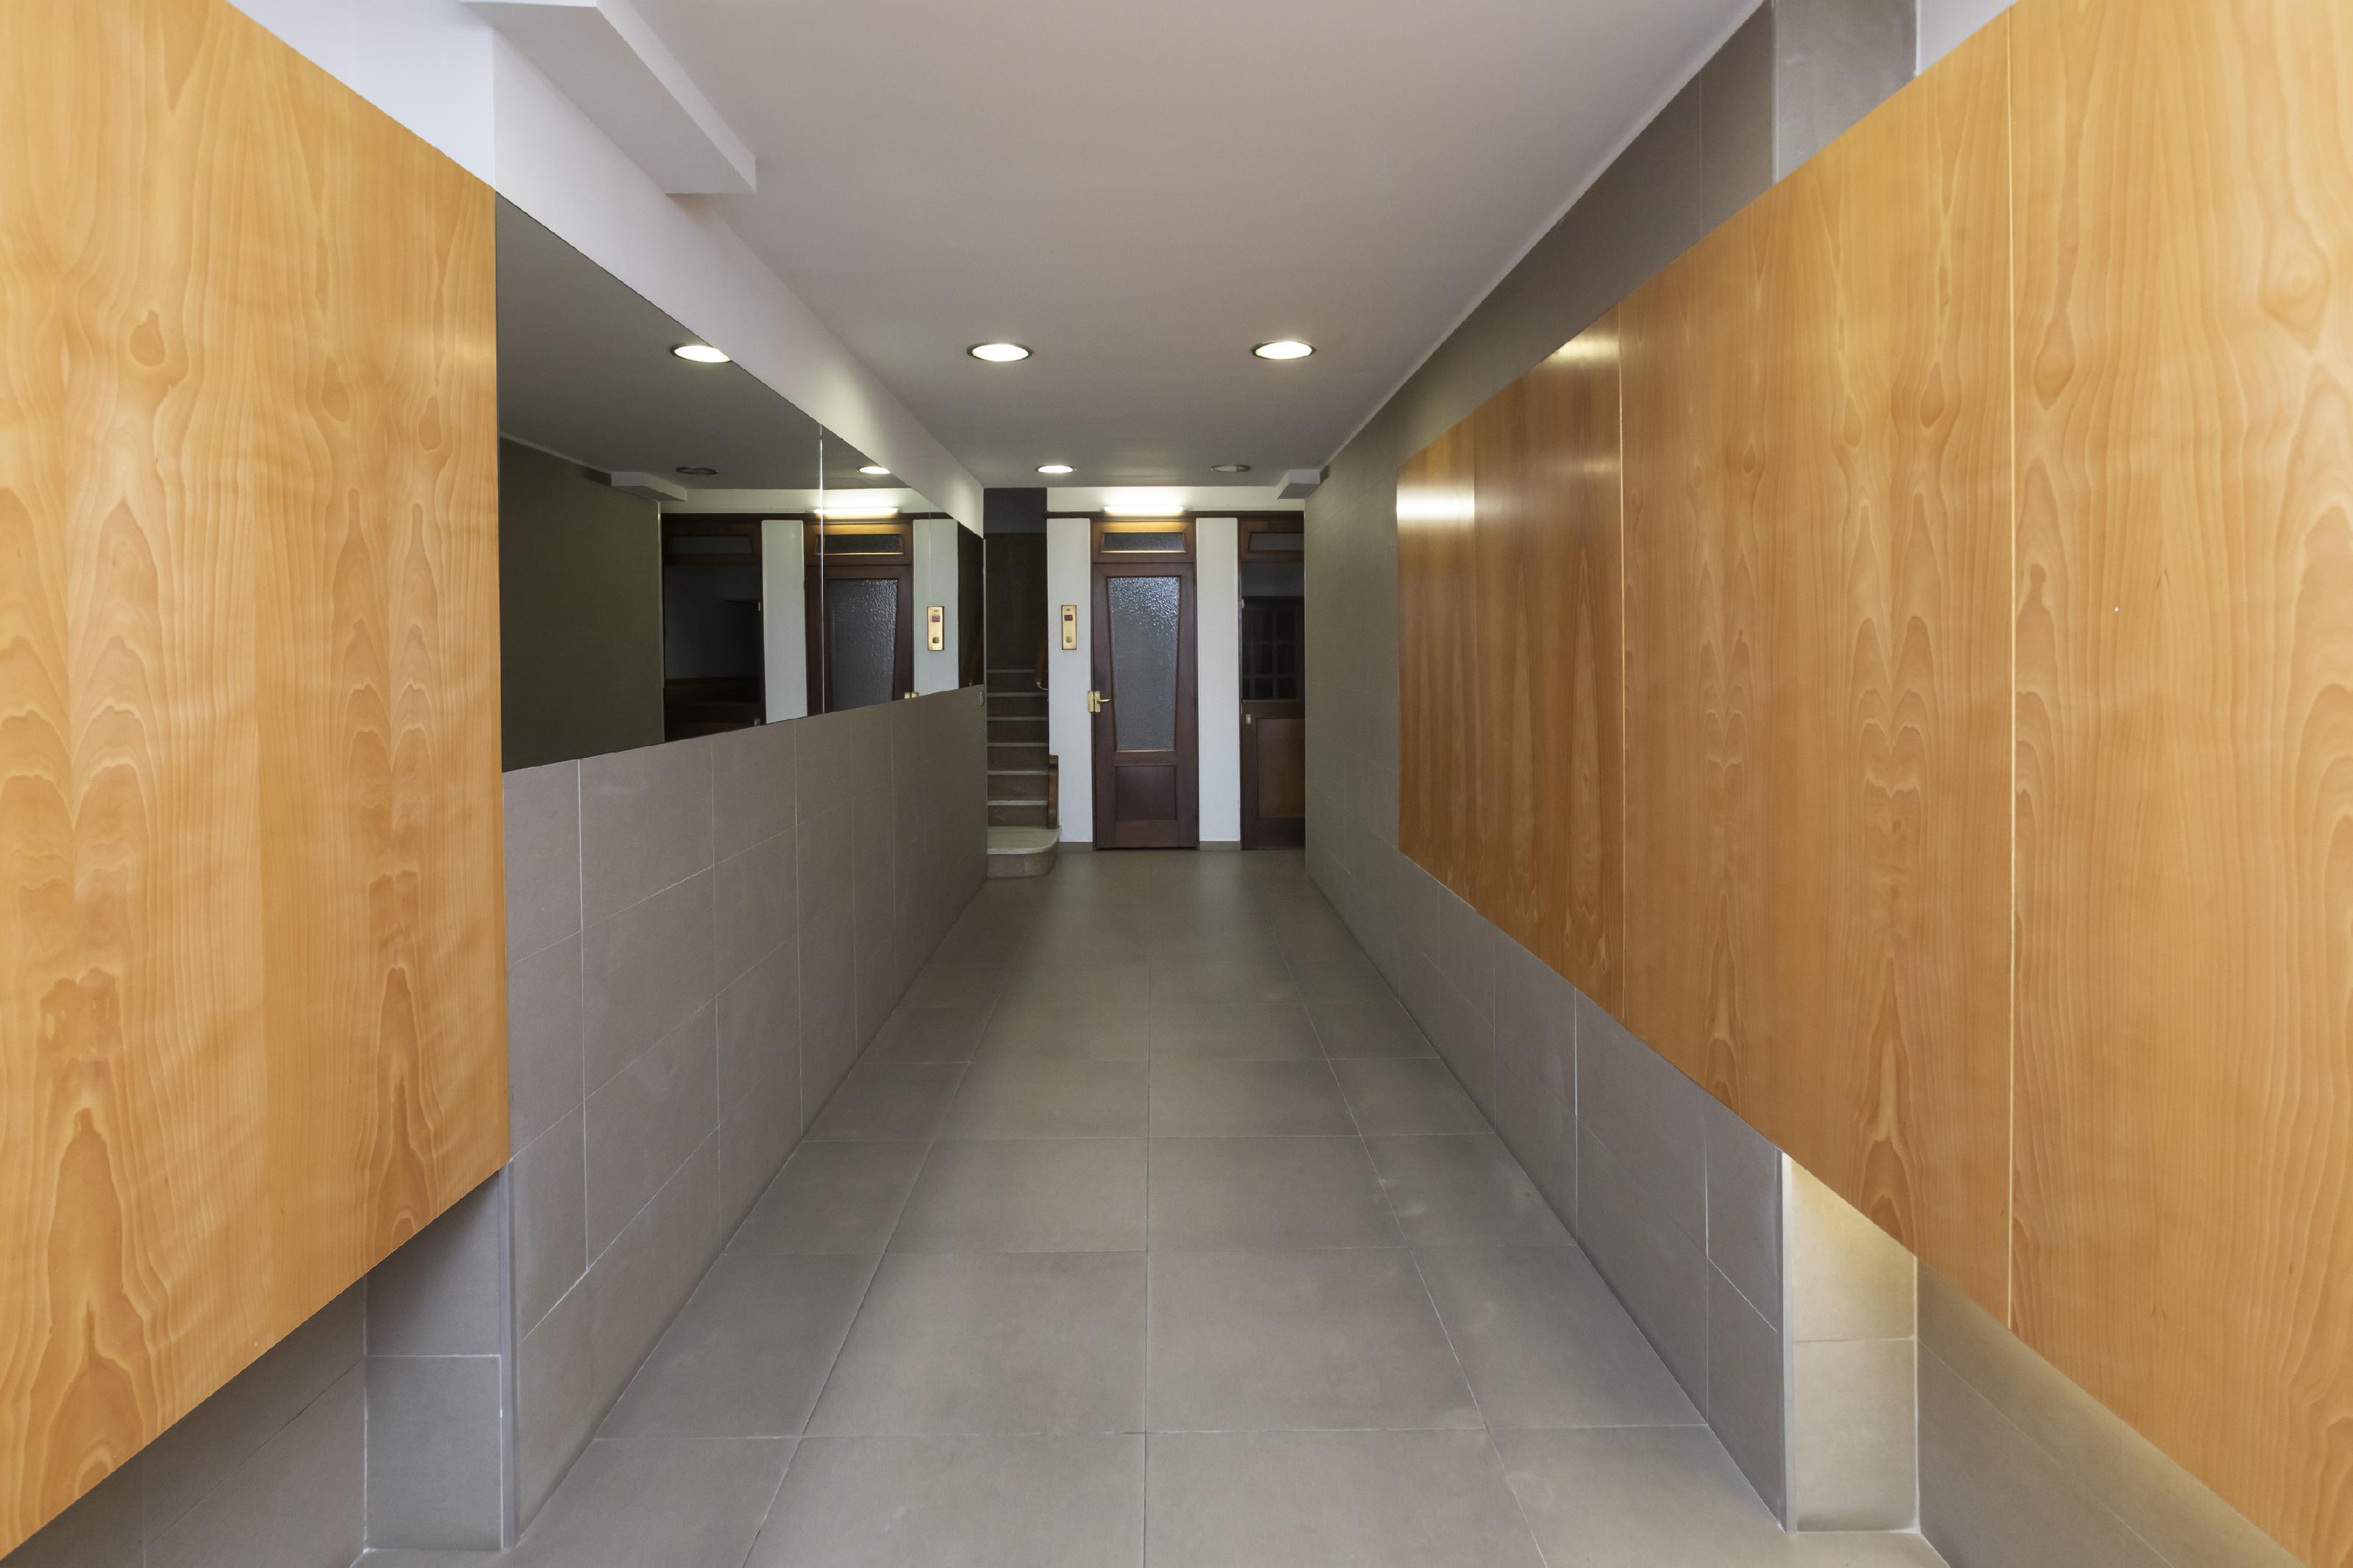 247097 Flat for sale in Sarrià-Sant Gervasi, Sant Gervasi-Galvany 33